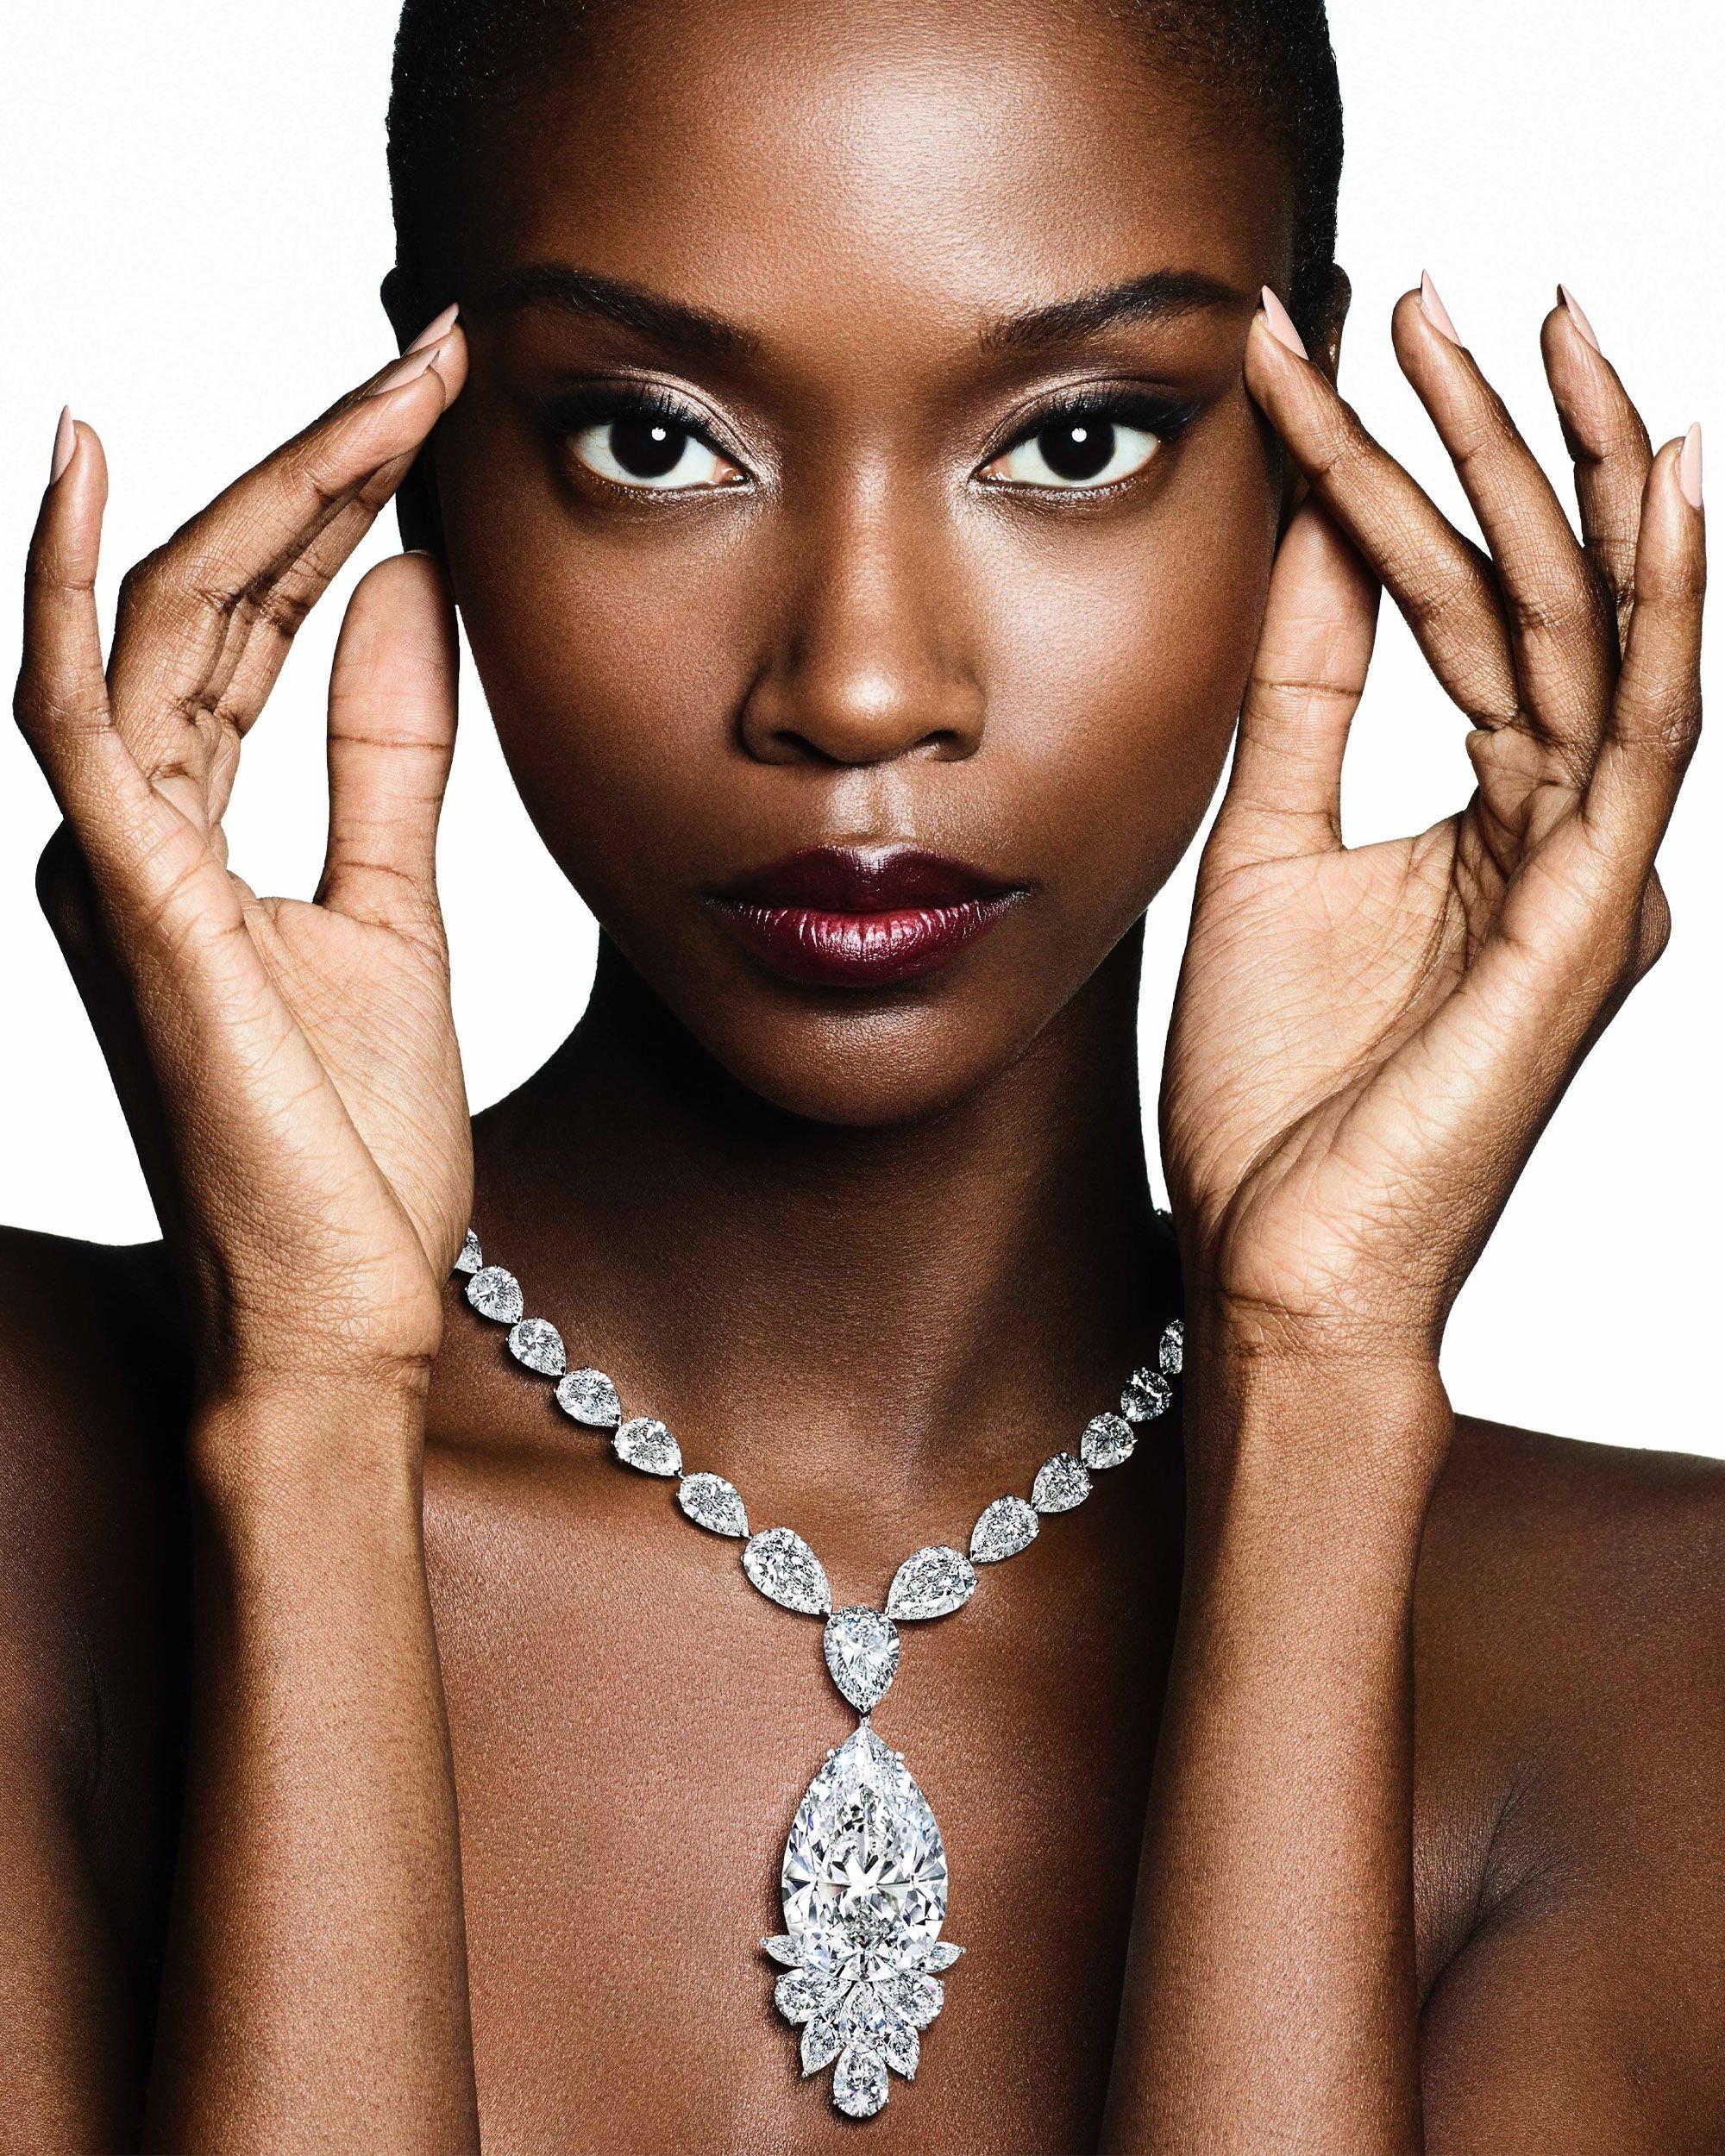 Model wears a Graff high jewellery diamond necklace featuring a pear shape diamond from the Meya Prosperity